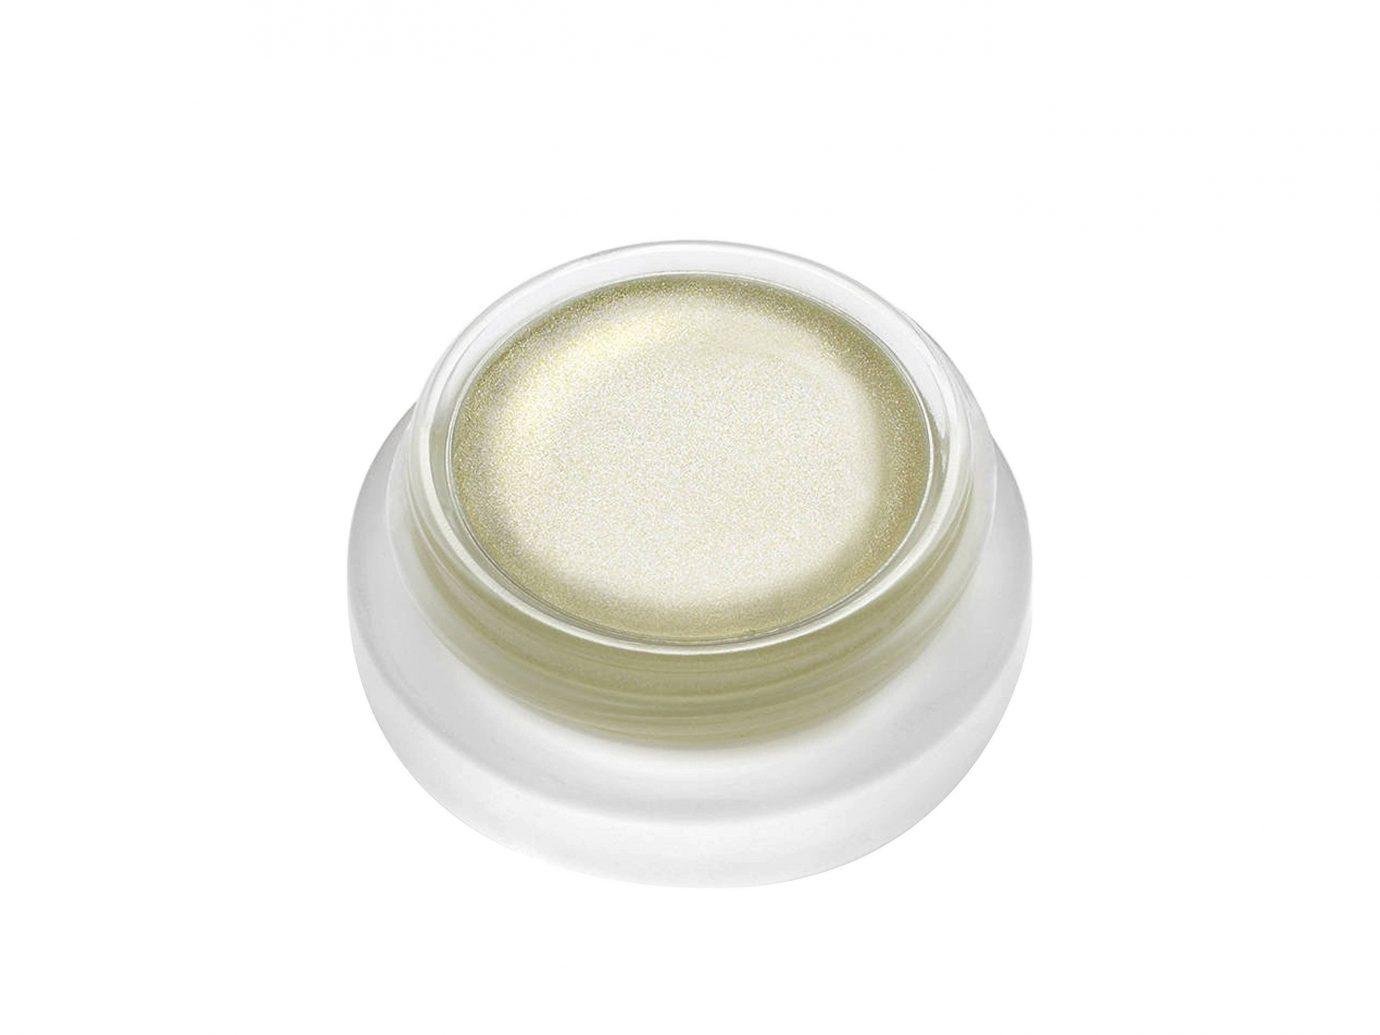 Style + Design Travel Shop product Petri dish cosmetics kitchenware powder tableware dishware